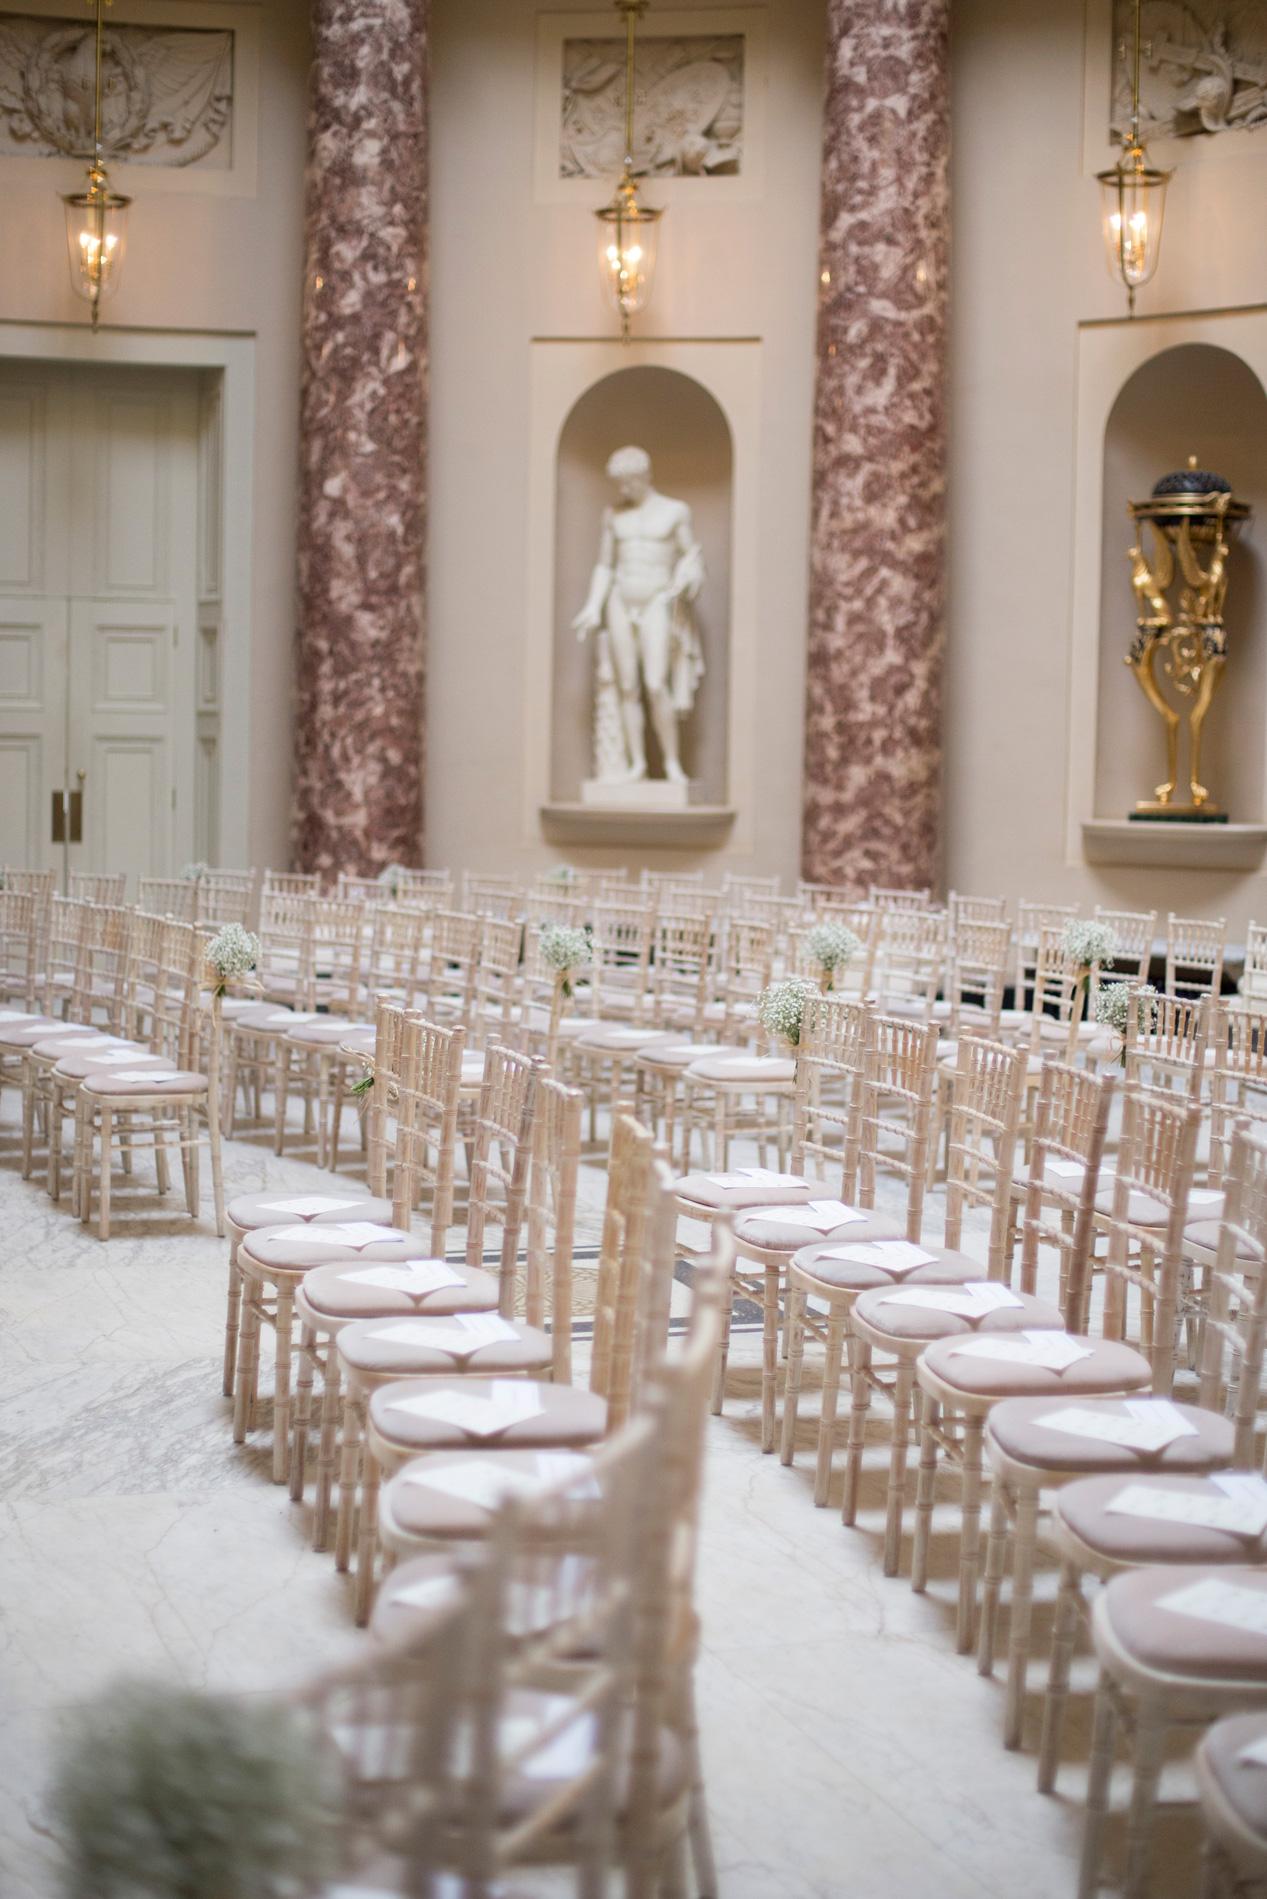 chairs, interior, Stowe, Buckinghamshire,